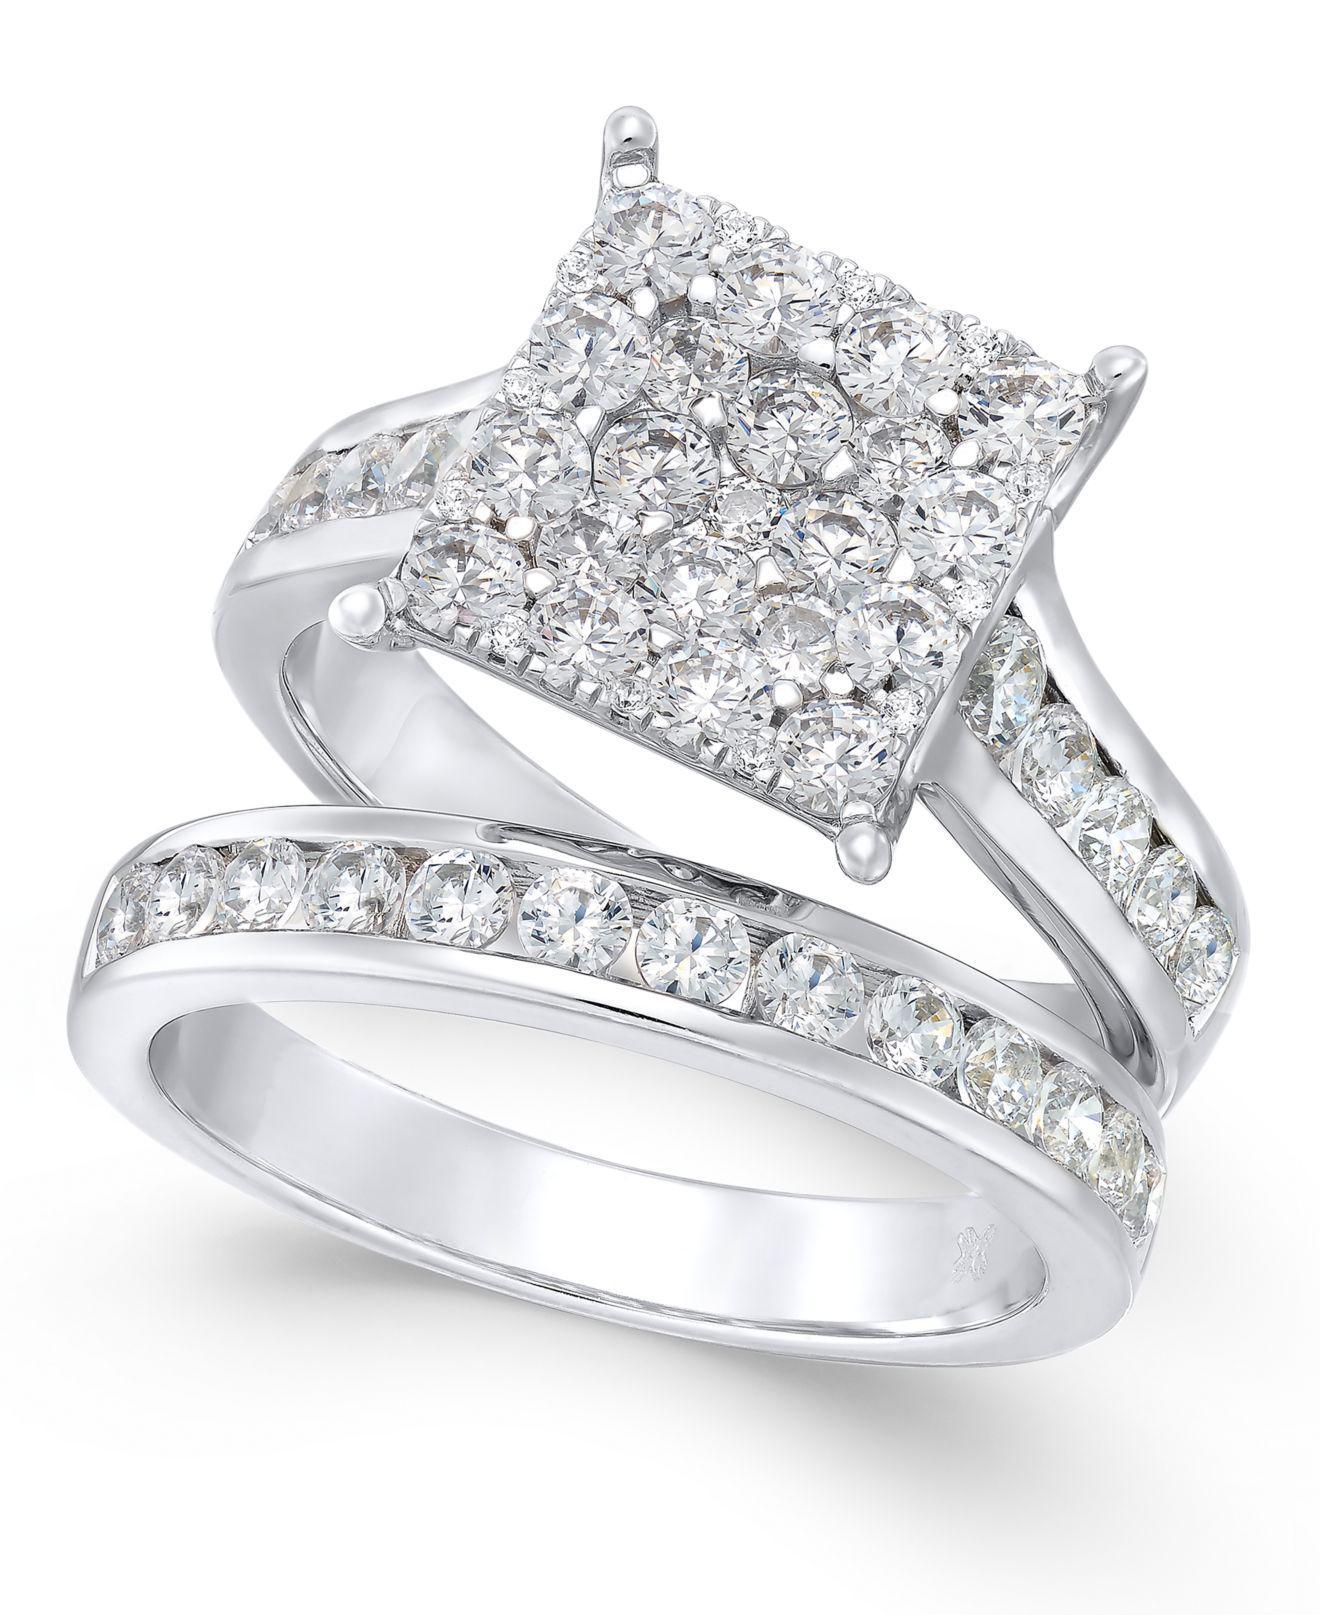 Macy s Diamond Square Cluster Bridal Set 2 Ct T w In 14k White